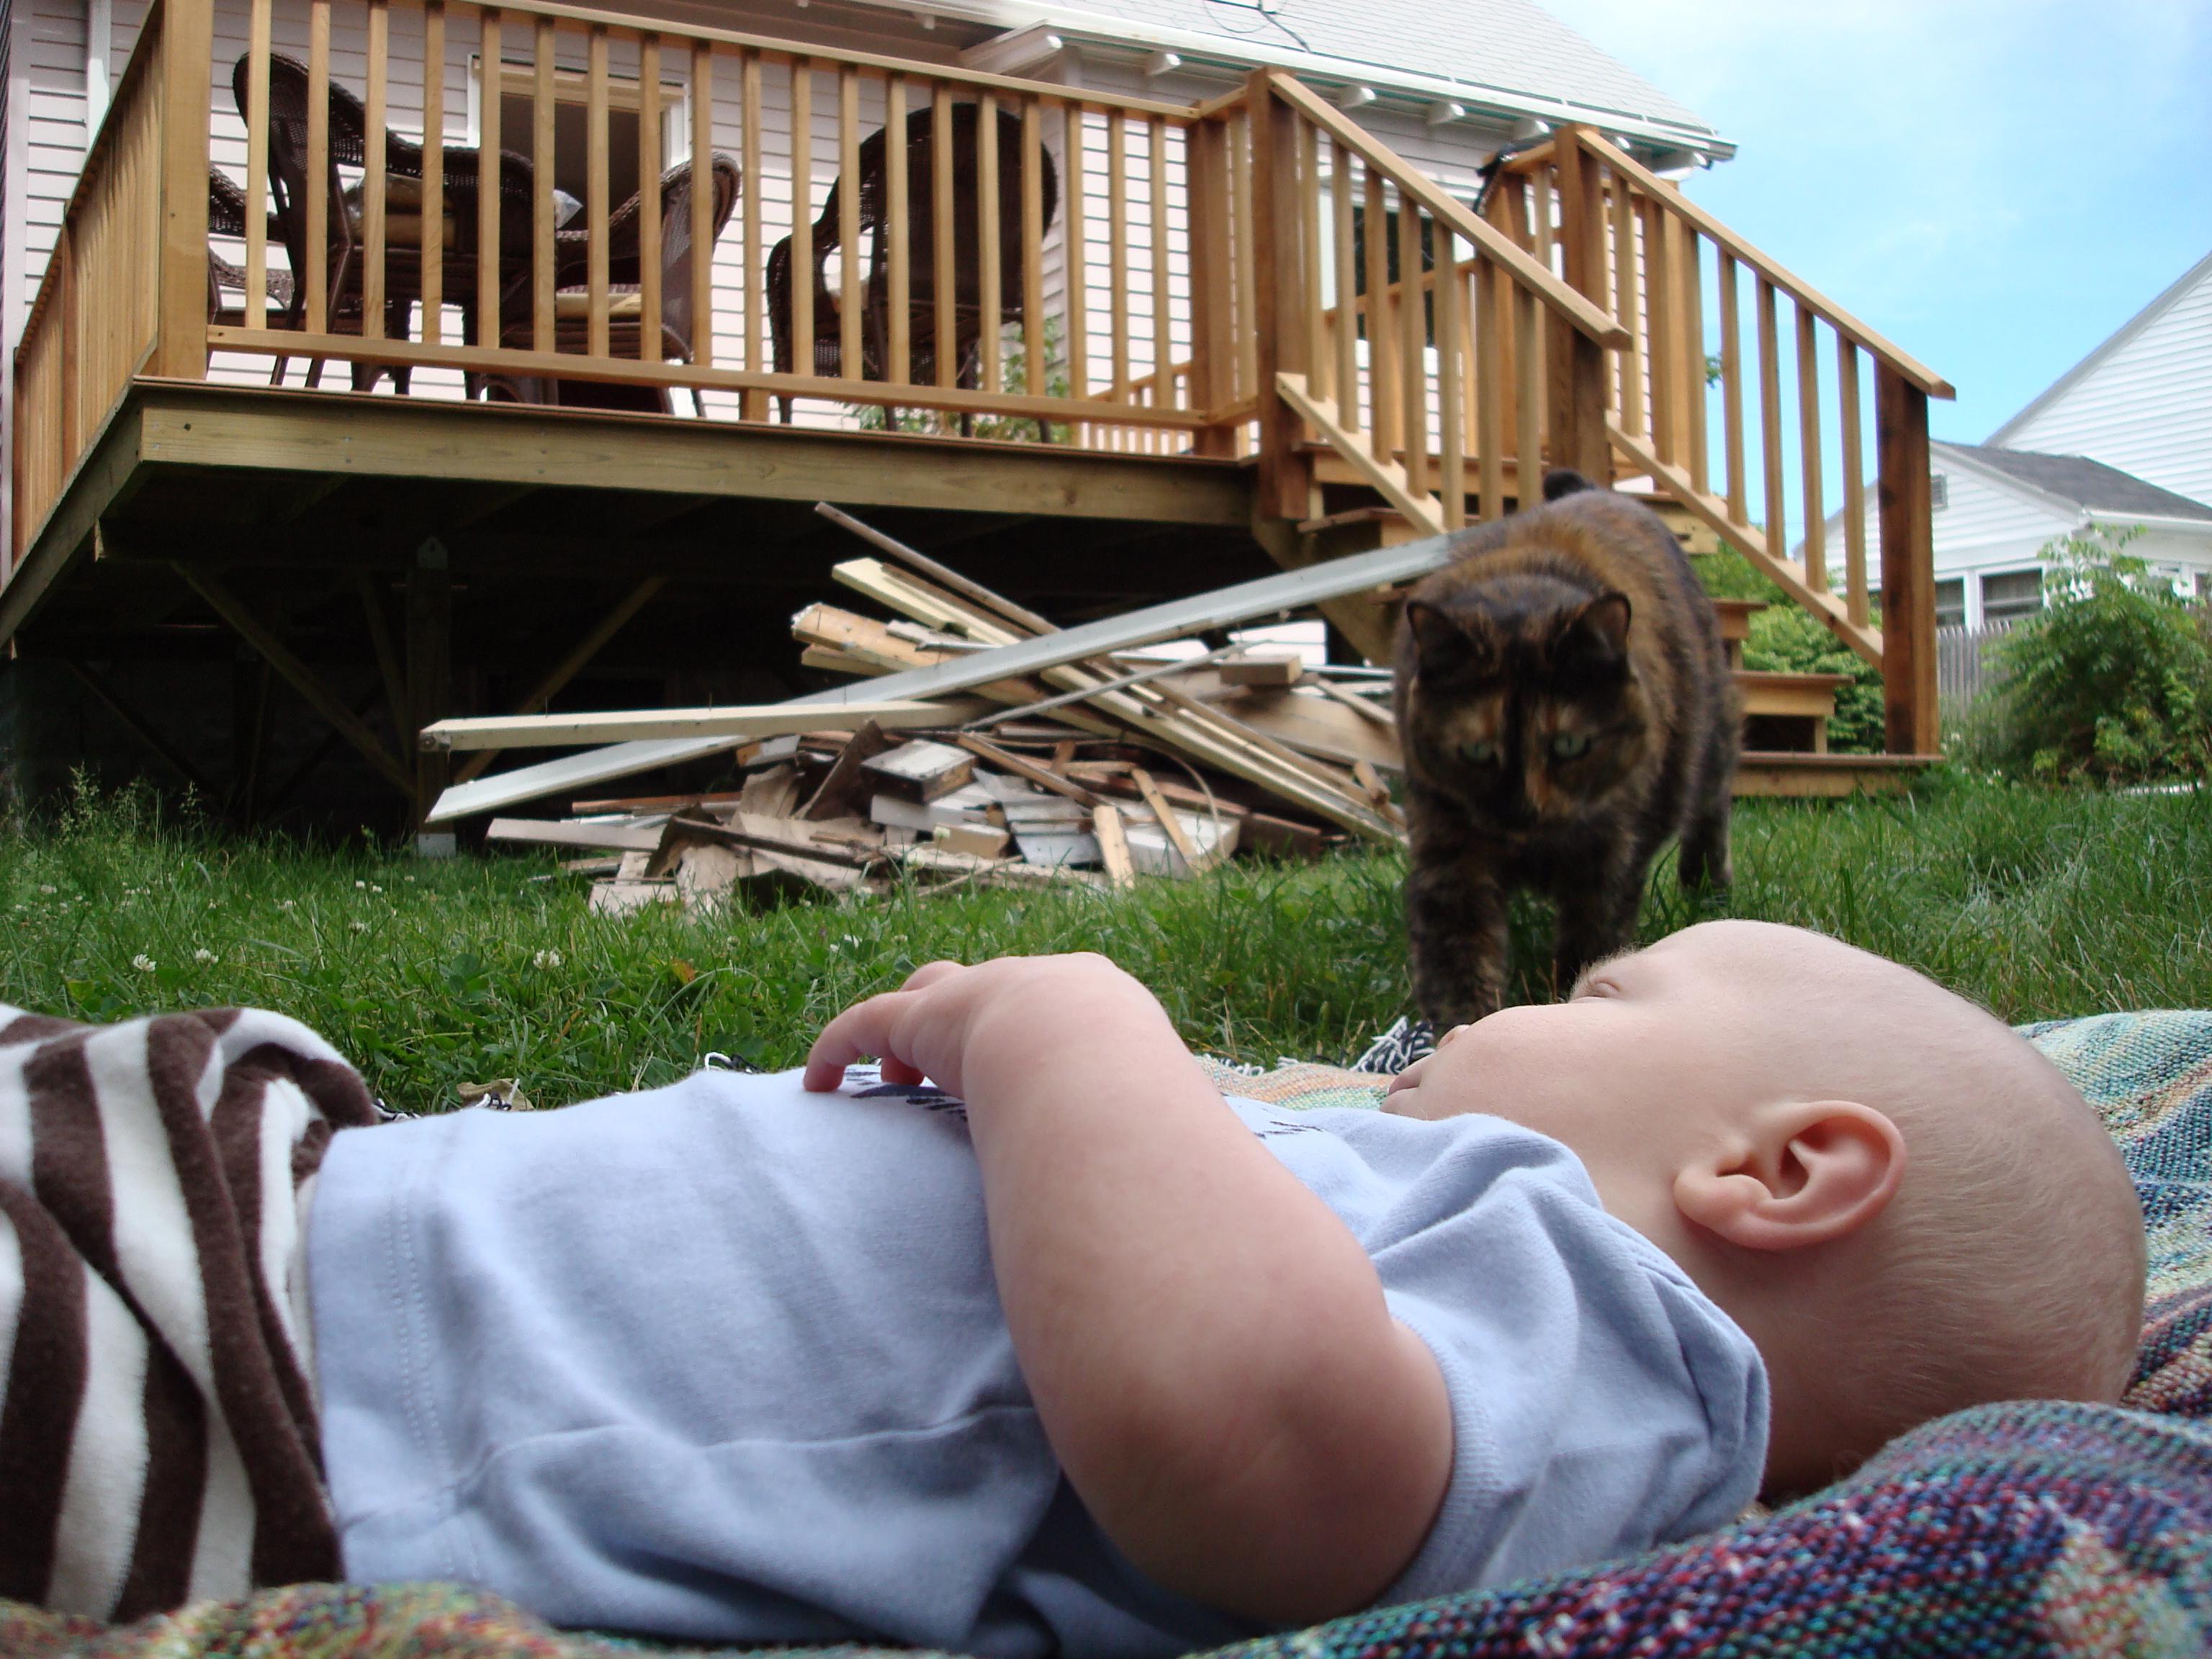 Baby in peril?